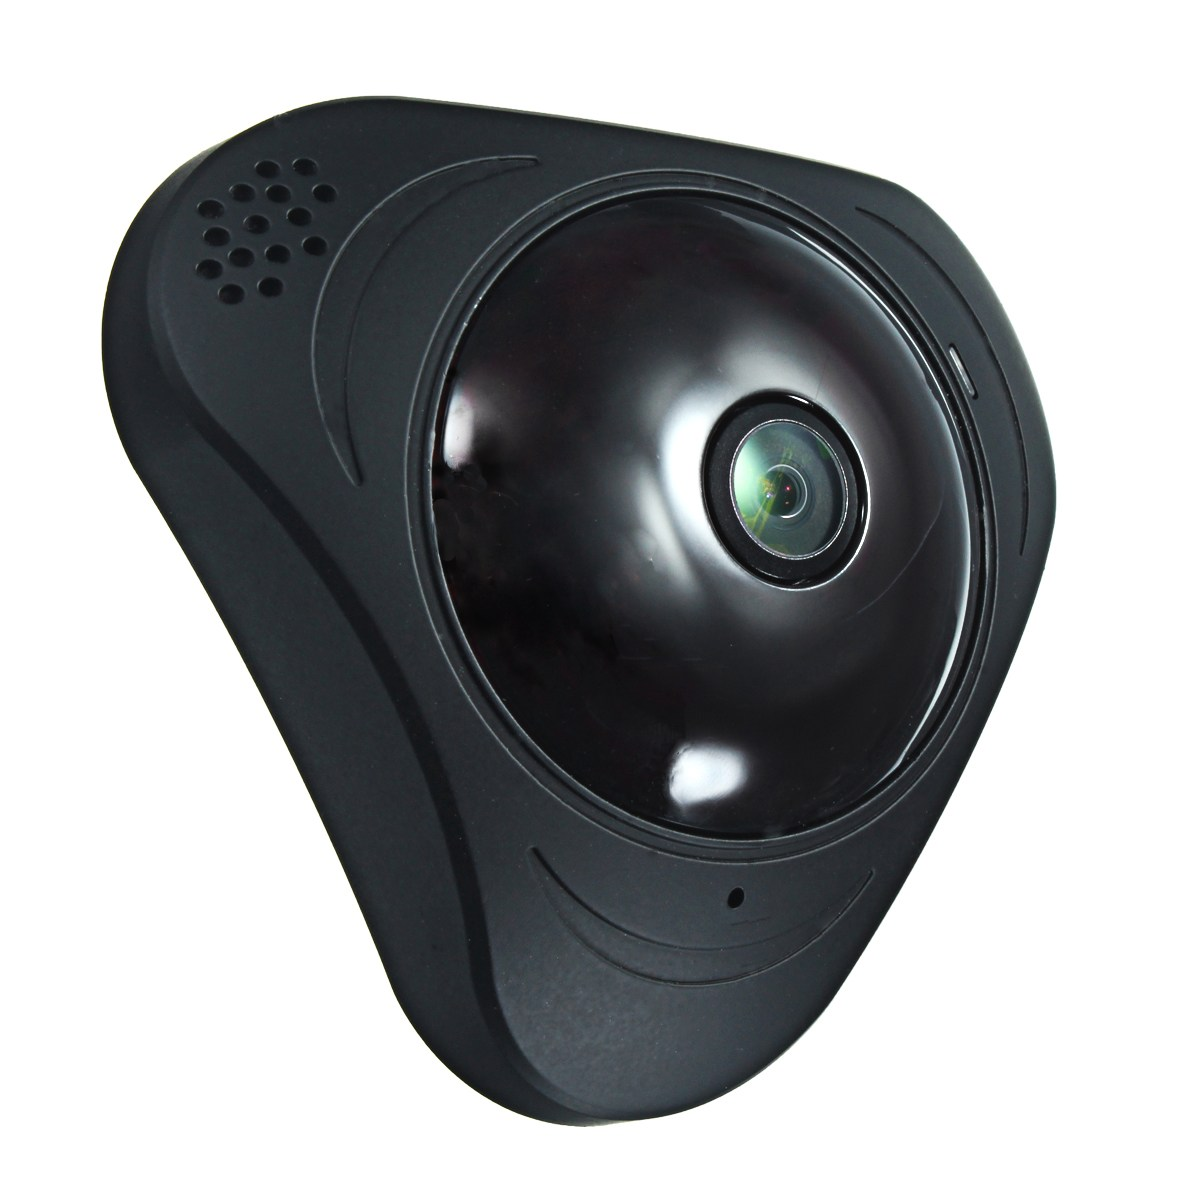 Safurance 3D VR WIFI Camera 360 Degree Panoramic FIsheye 960P WIreless Indoor Home Security Safety Surveillance CCTV горелка tbi sb 360 blackesg 3 м